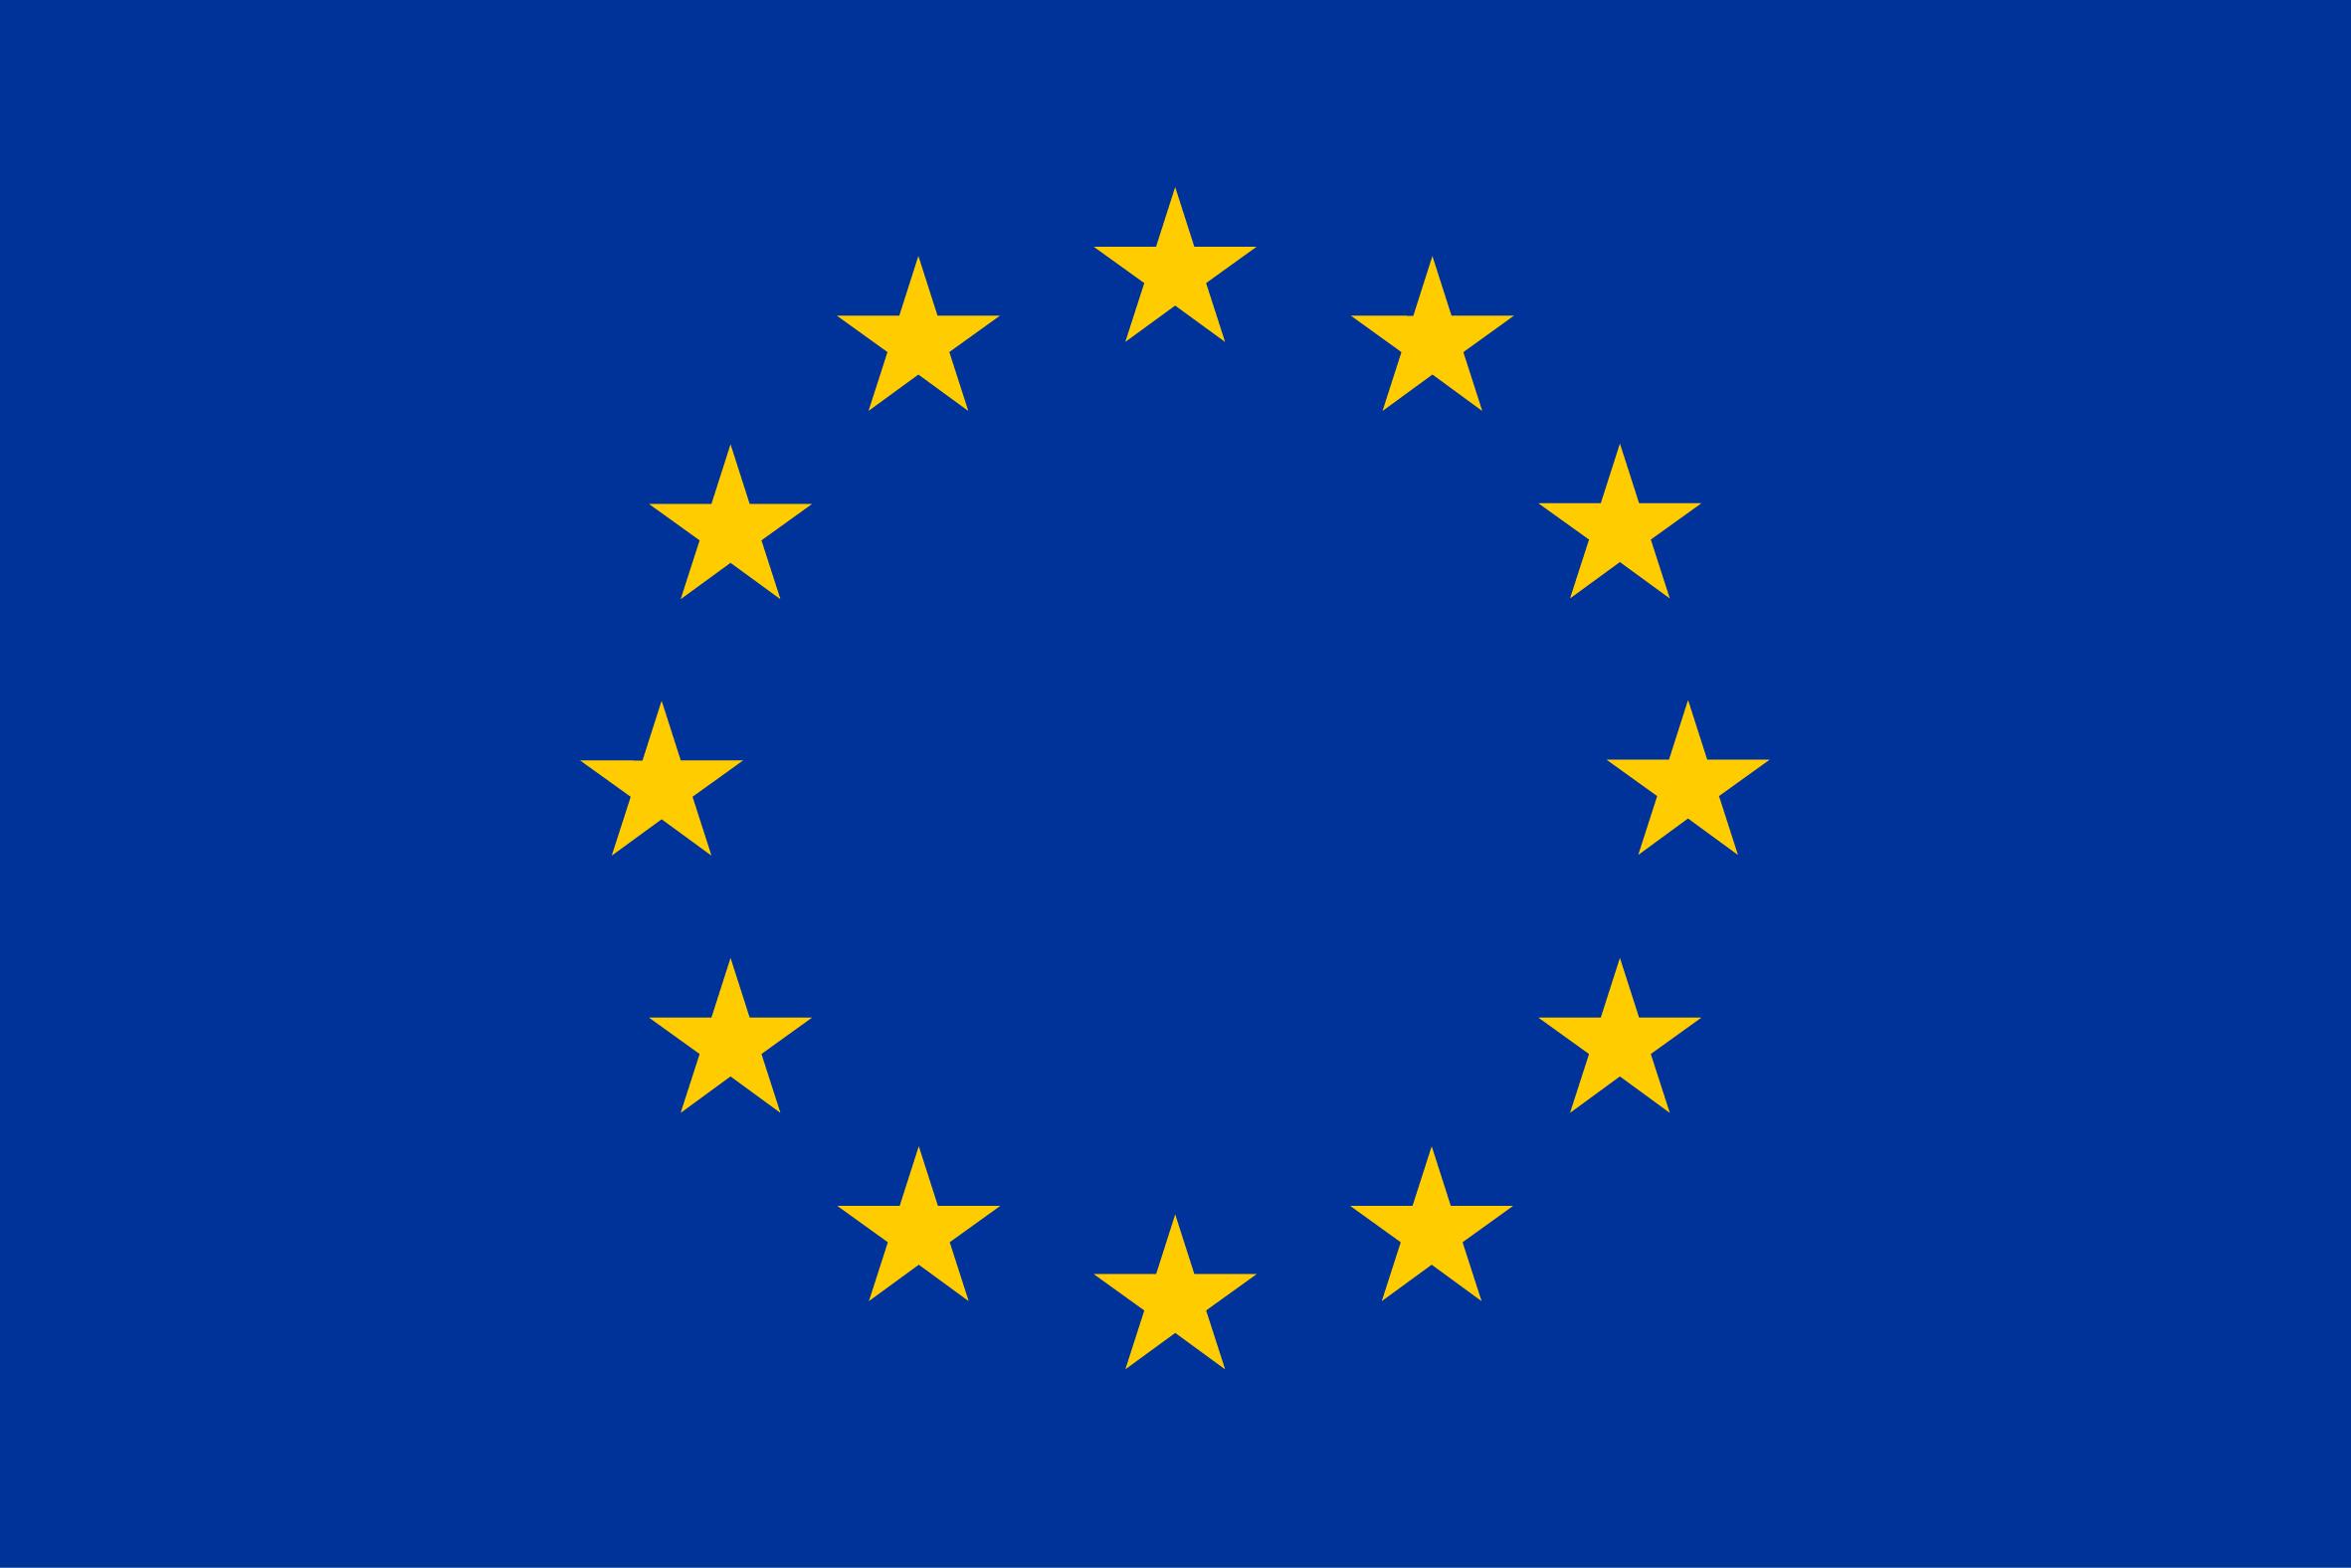 src/main/webapp/resources/images/eu_flag.jpg